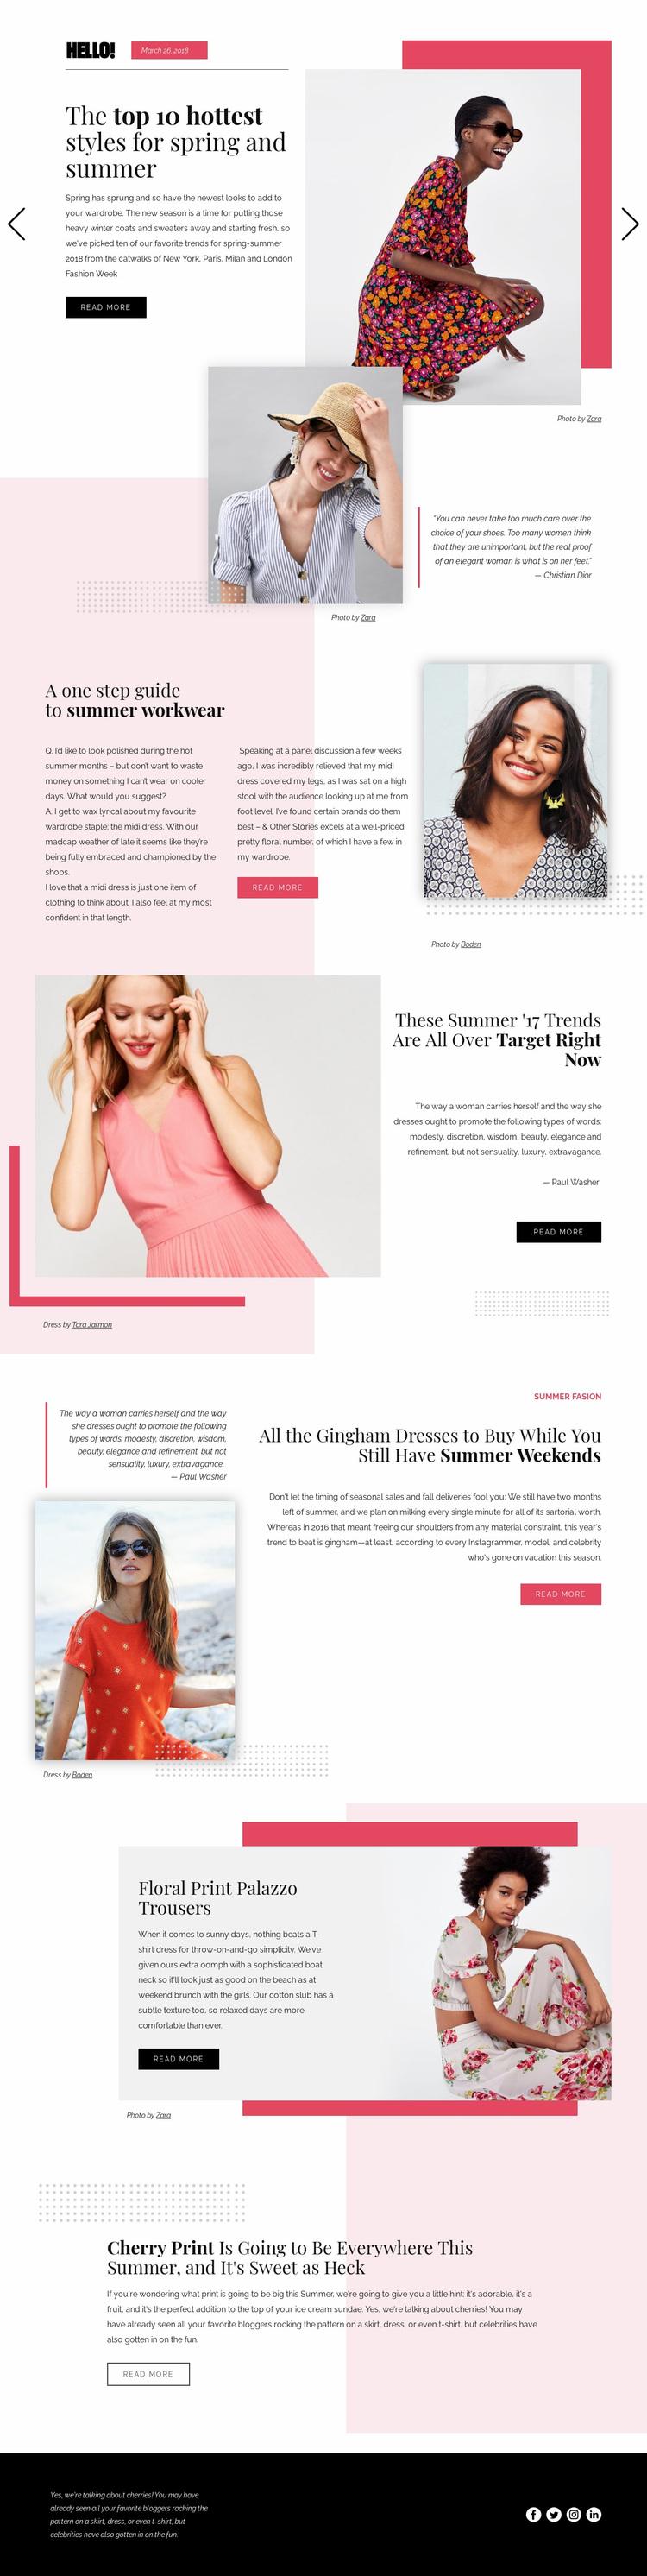 Fashion Trends Web Page Designer